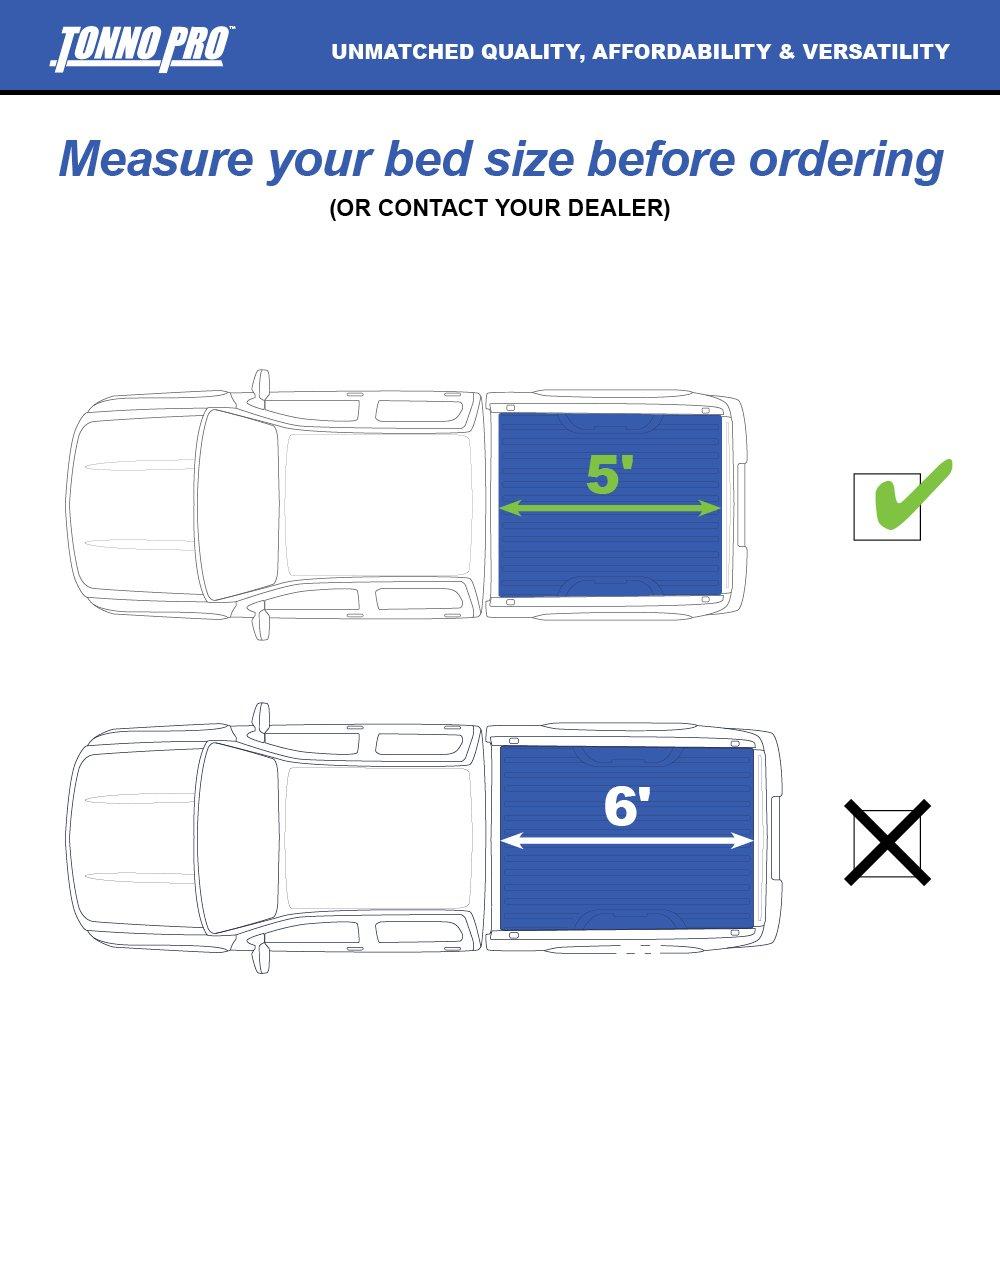 Toyota Tacoma 2015-2018 Service Manual: System Diagram